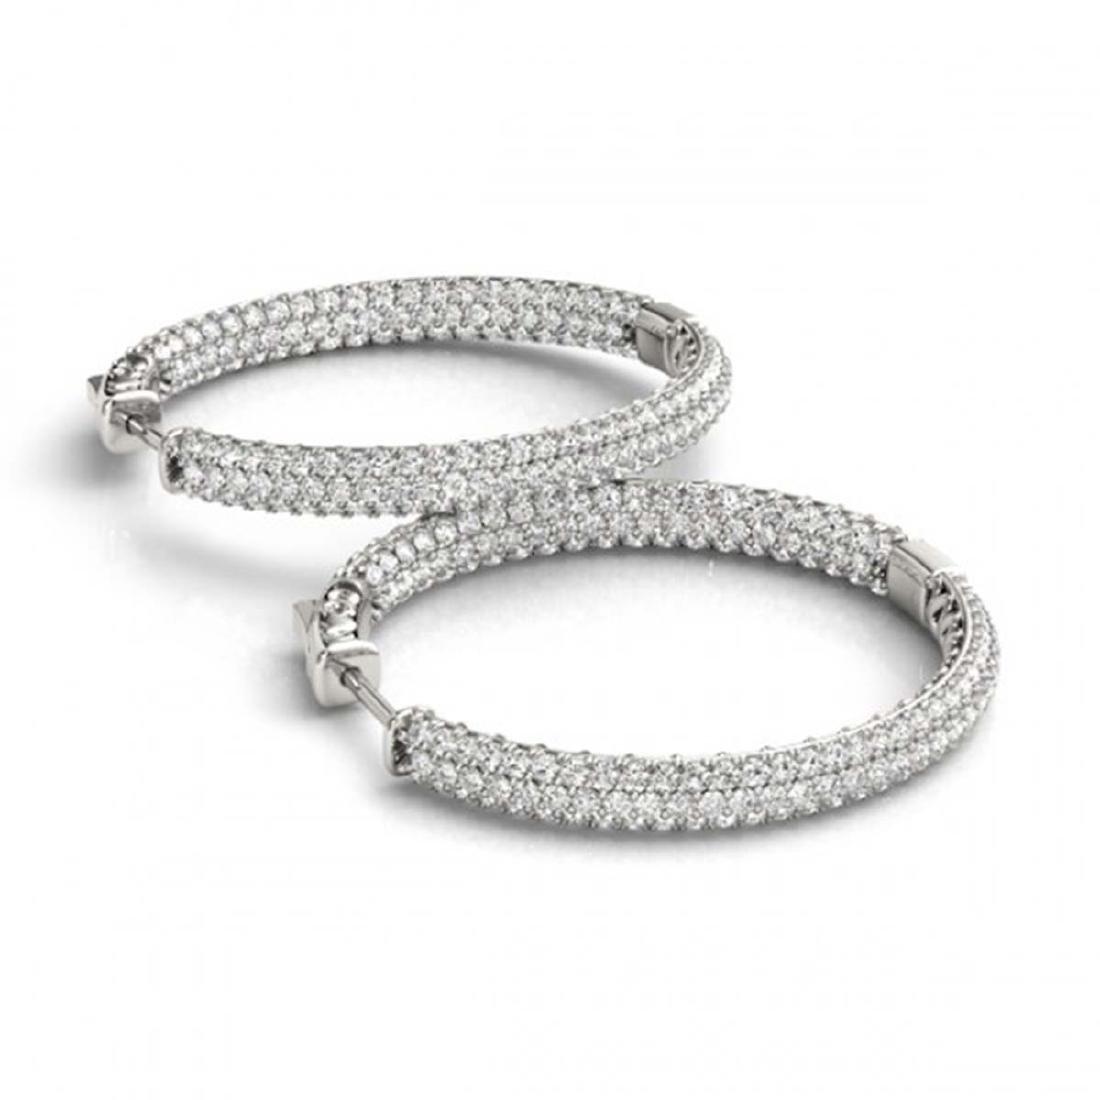 4.5 CTW Diamond VS/SI Certified 28 Mm Hoop Earrings 14K